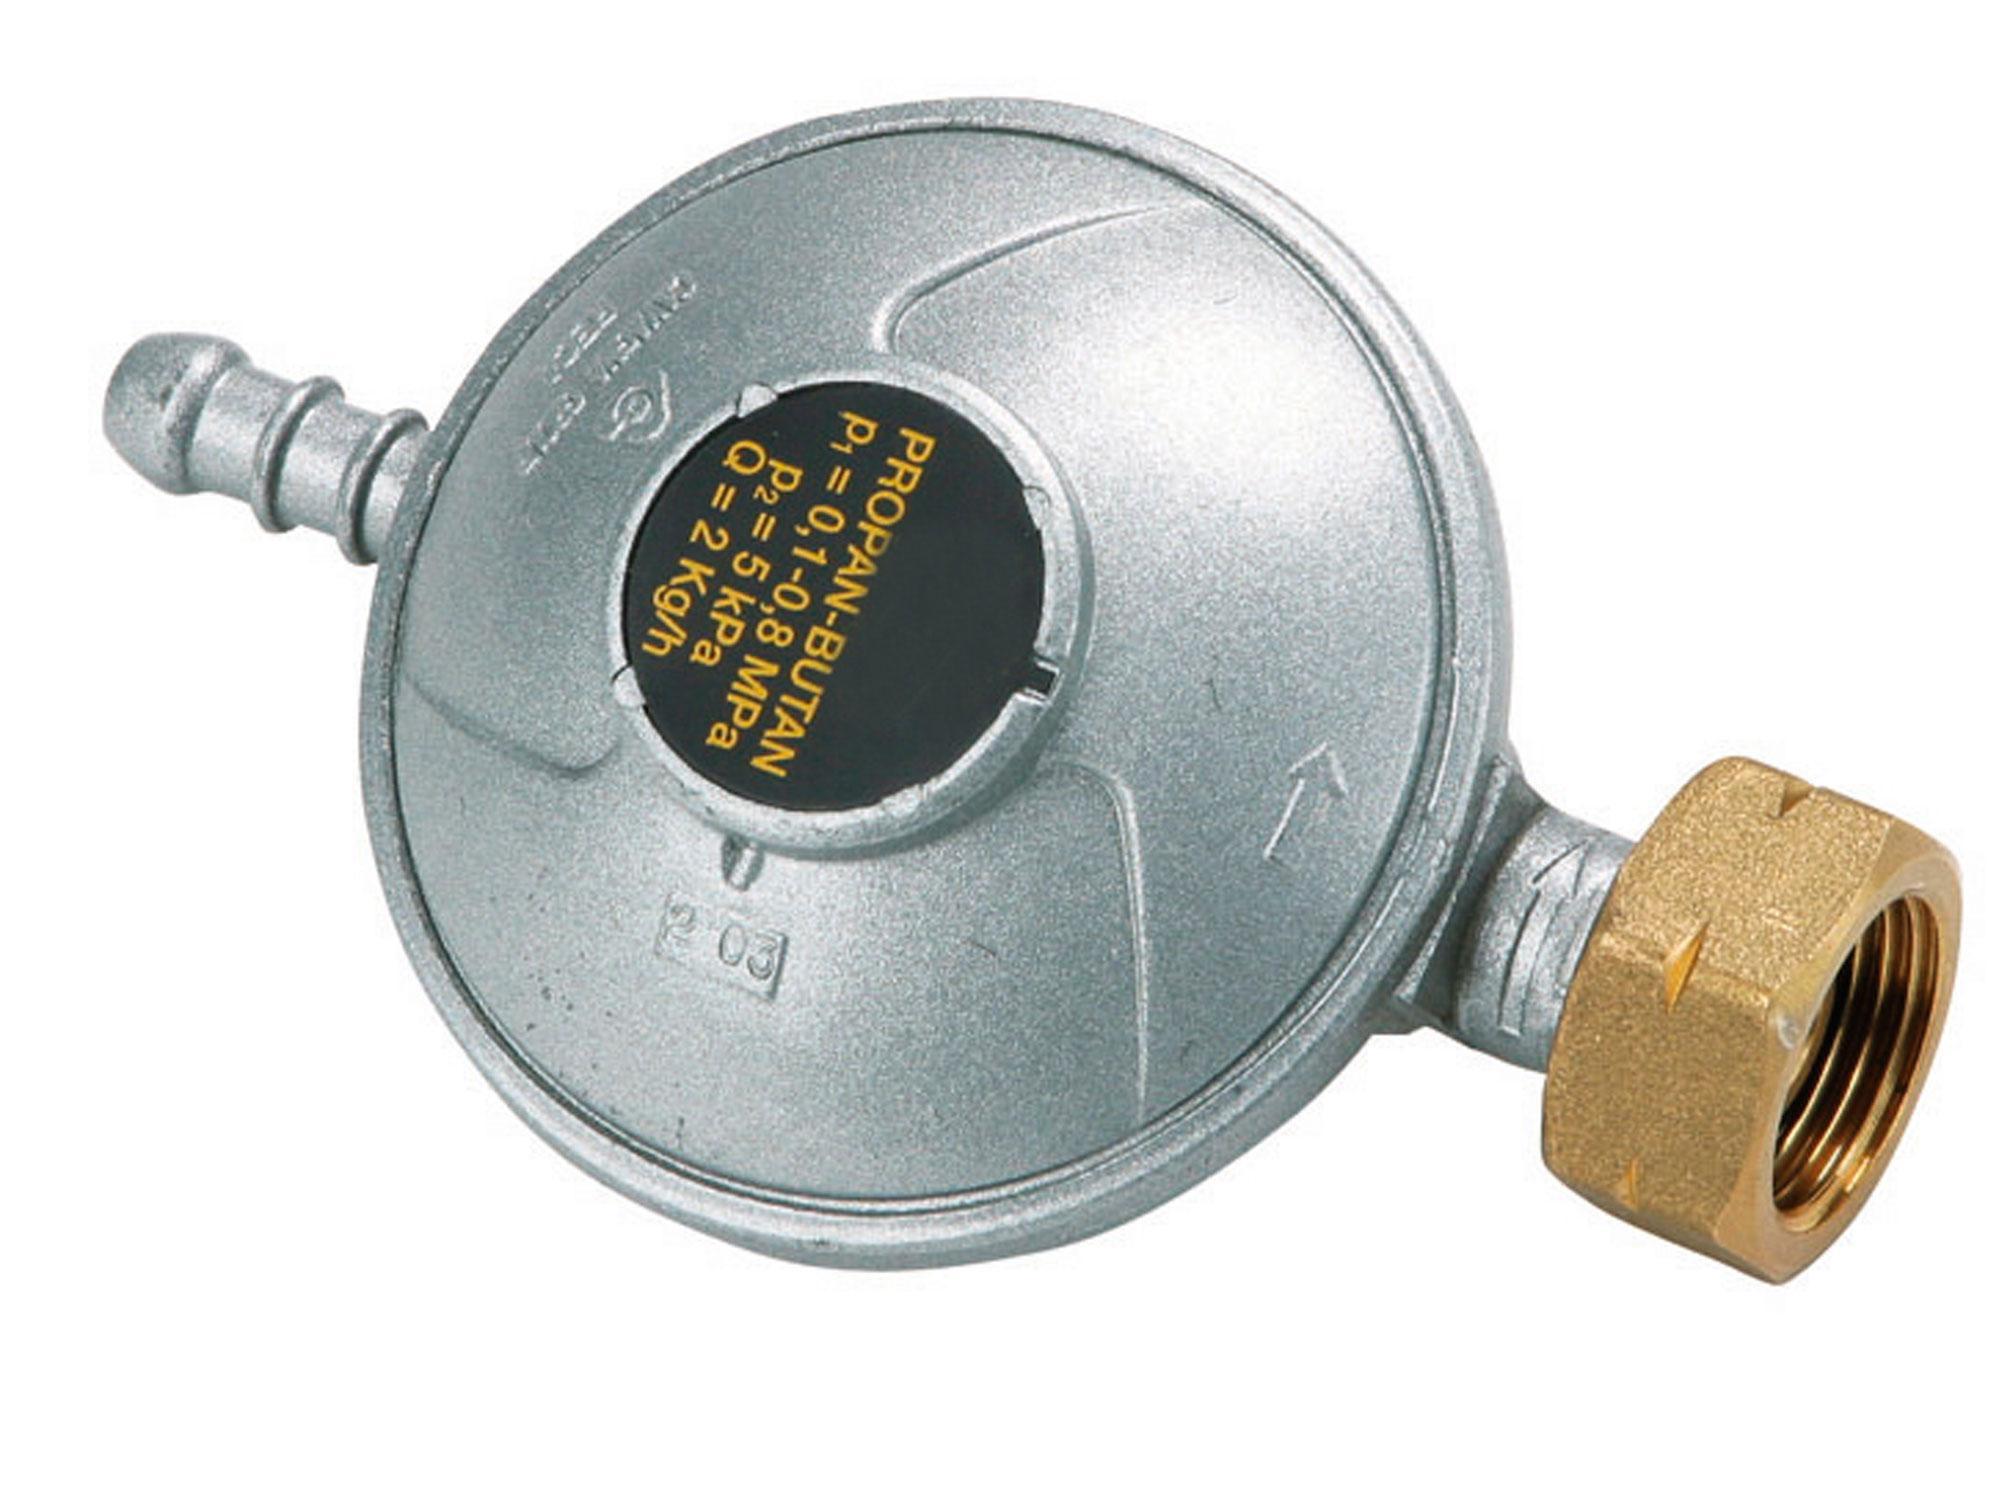 regulátor tlaku, 30mbar (3kPa)